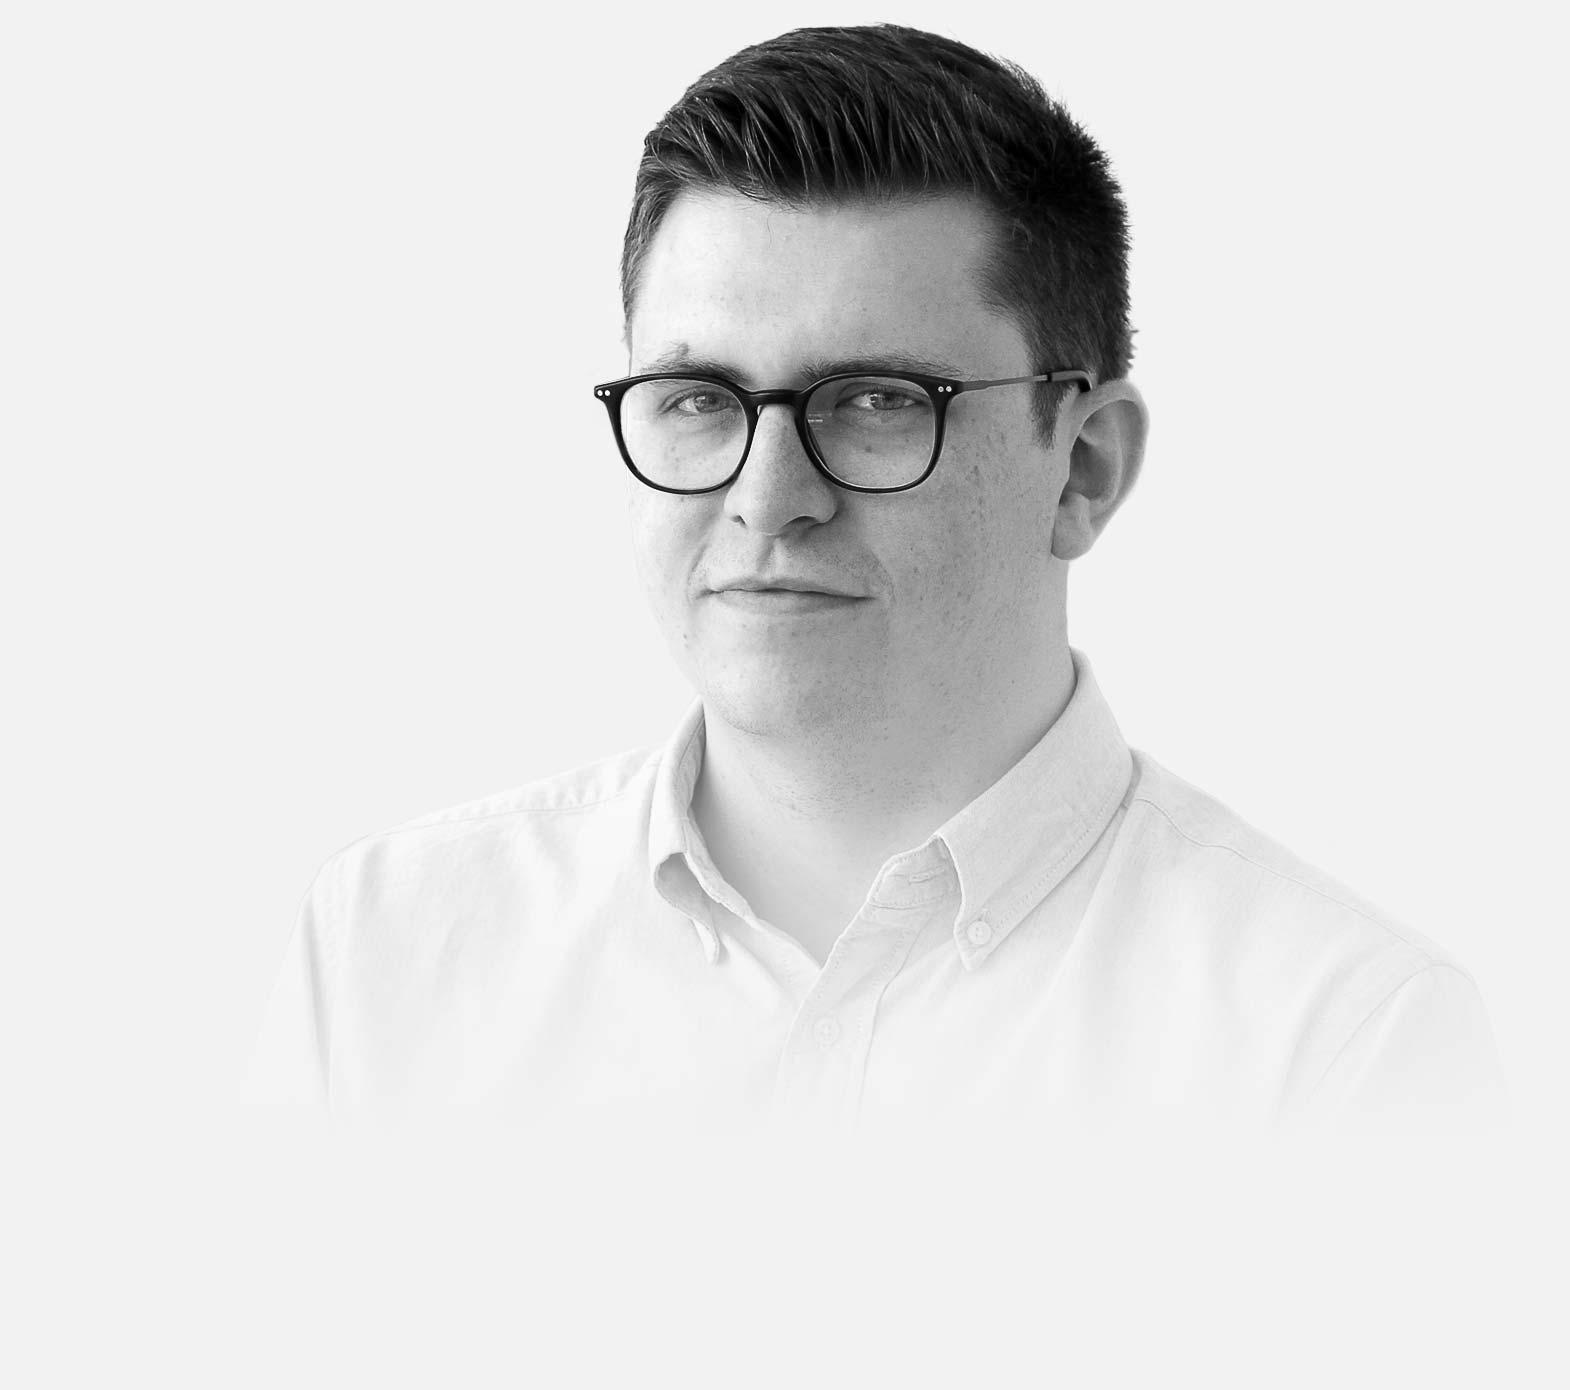 Portrait of Finlay Craig